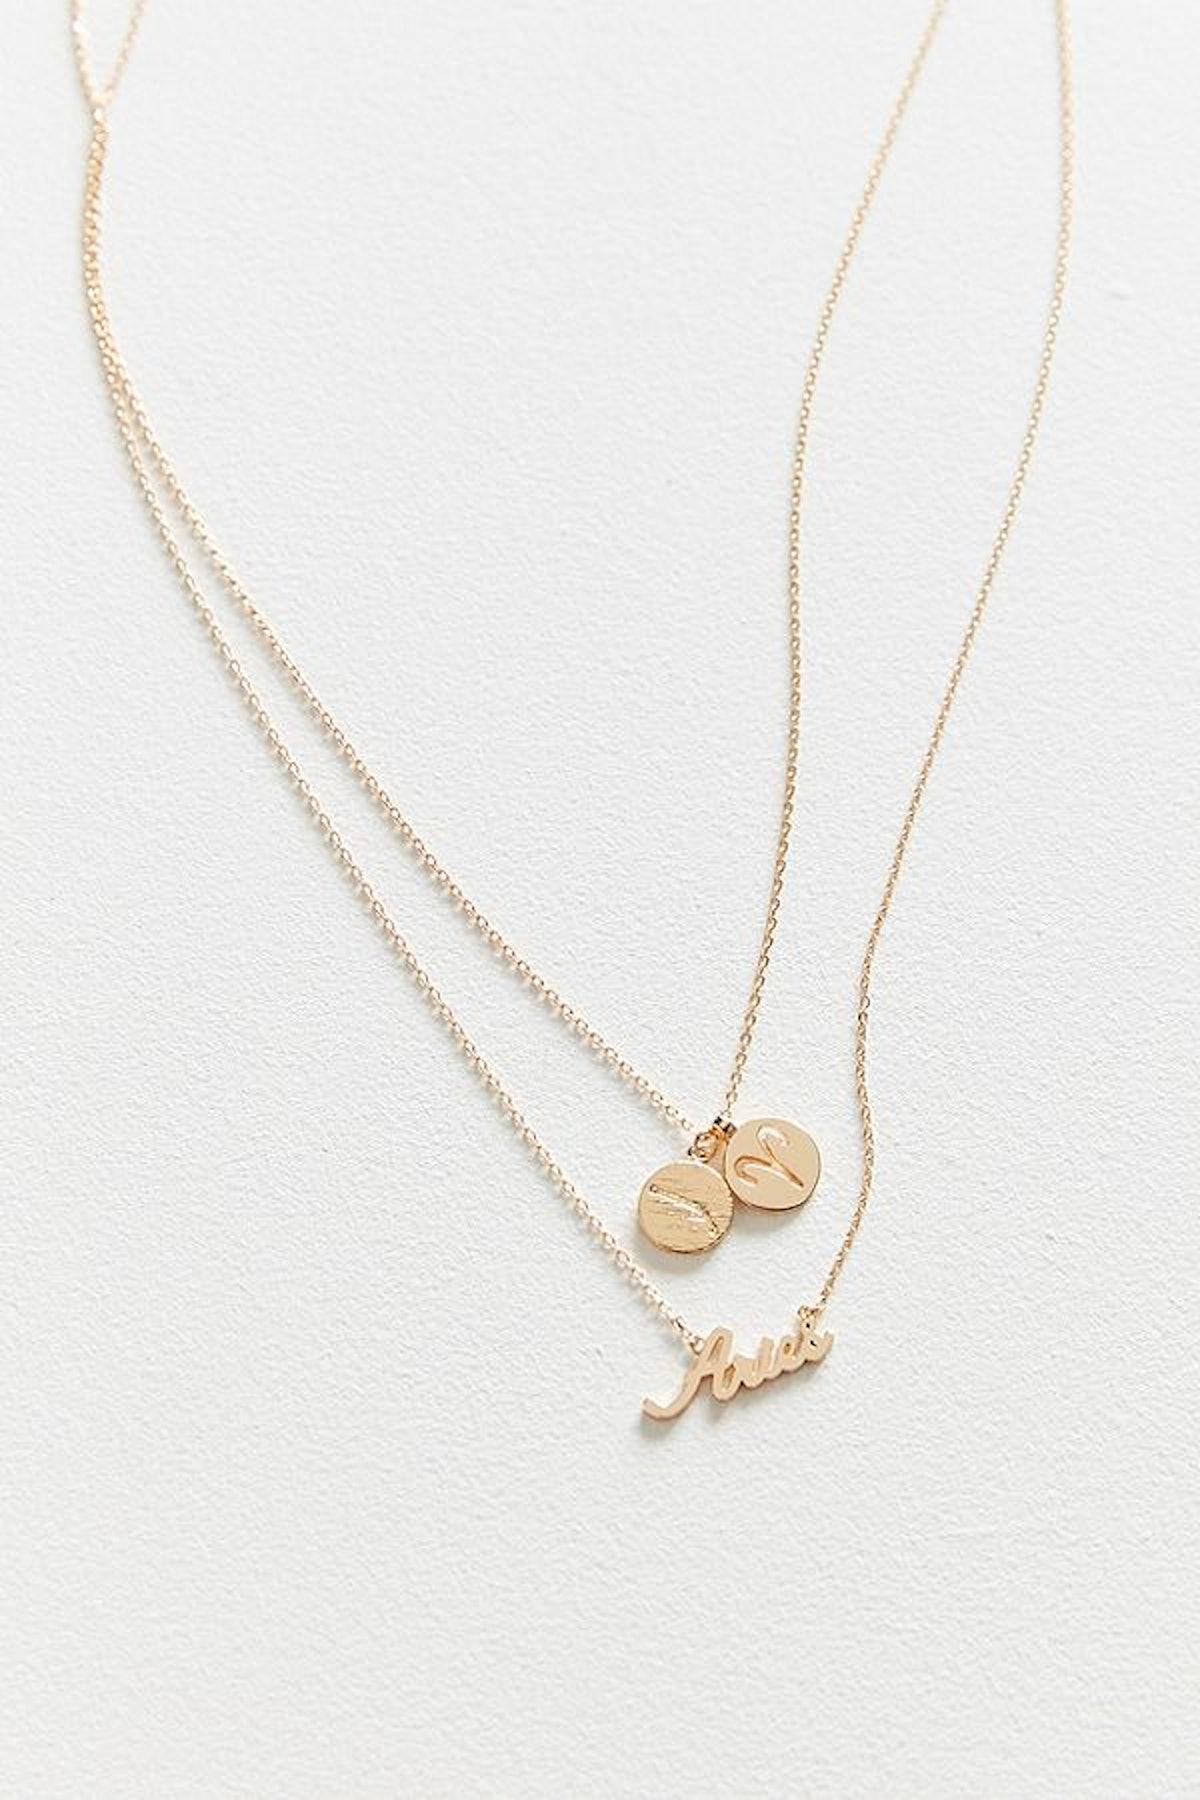 Aries Zodiac Layering Charm Necklace Set